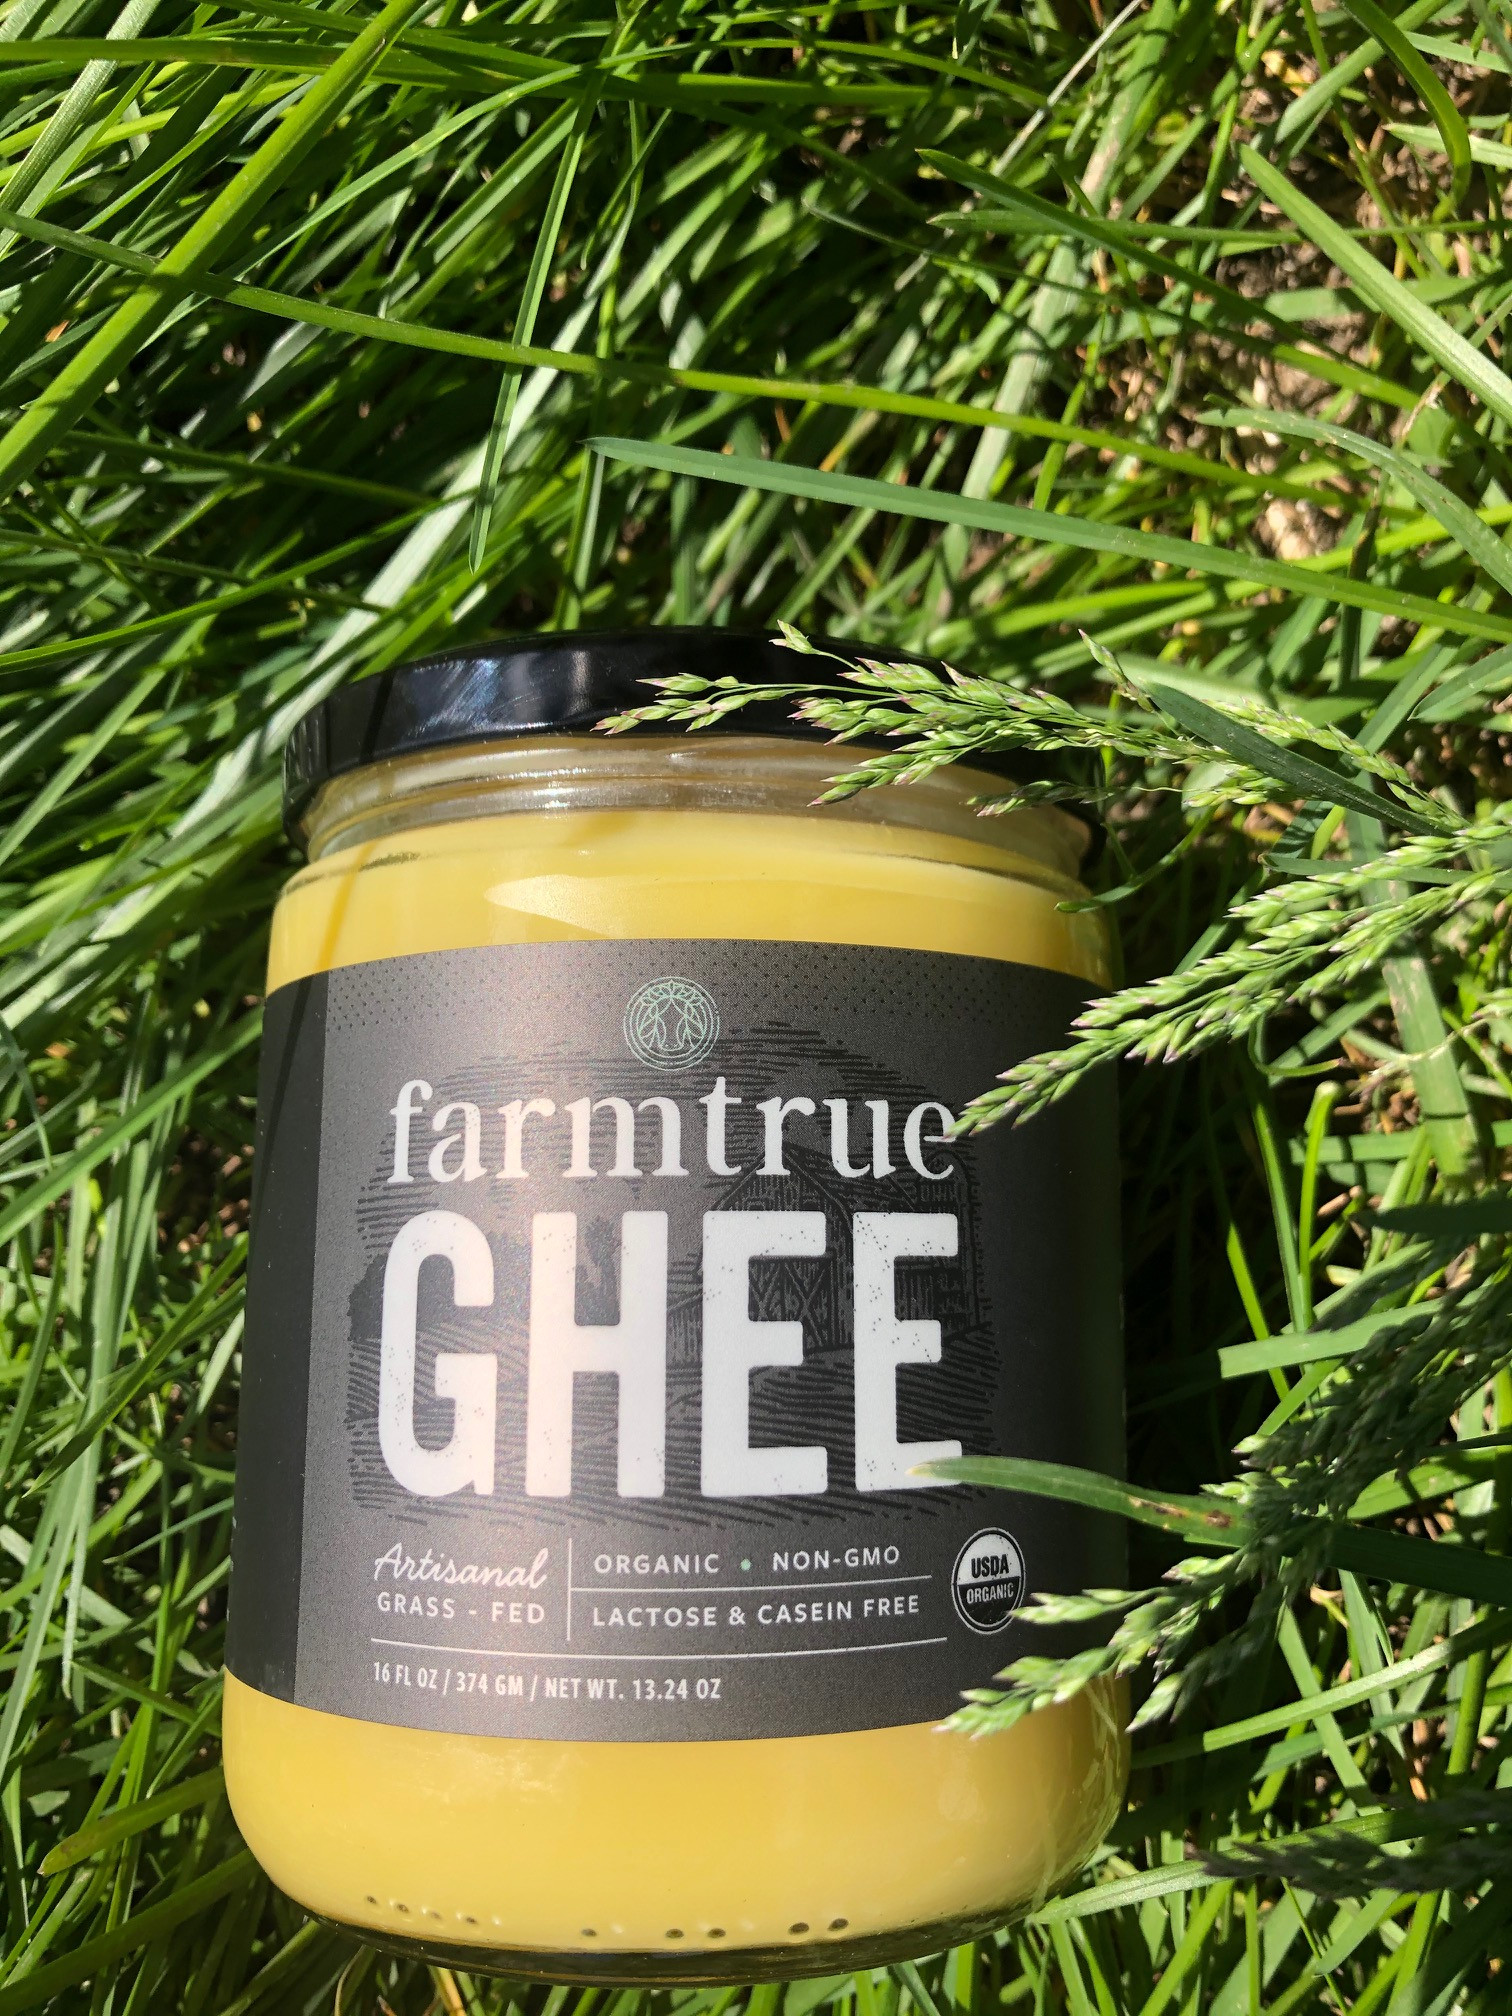 farmtrue: Traditional Ghee